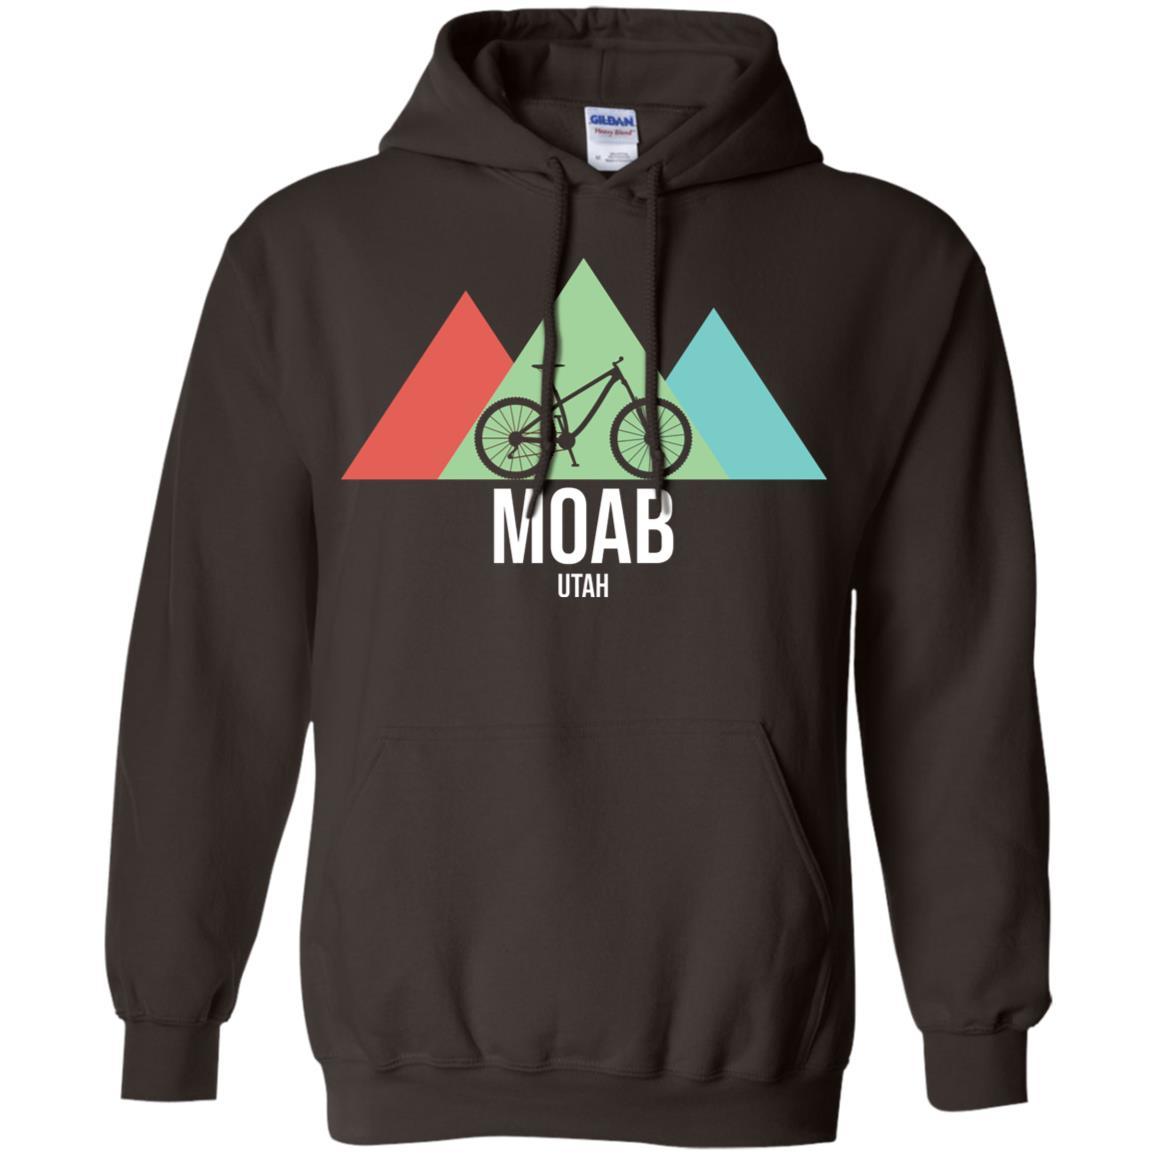 Retro Vintage Bike Moab Utah Mountain Biking Pullover Hoodie